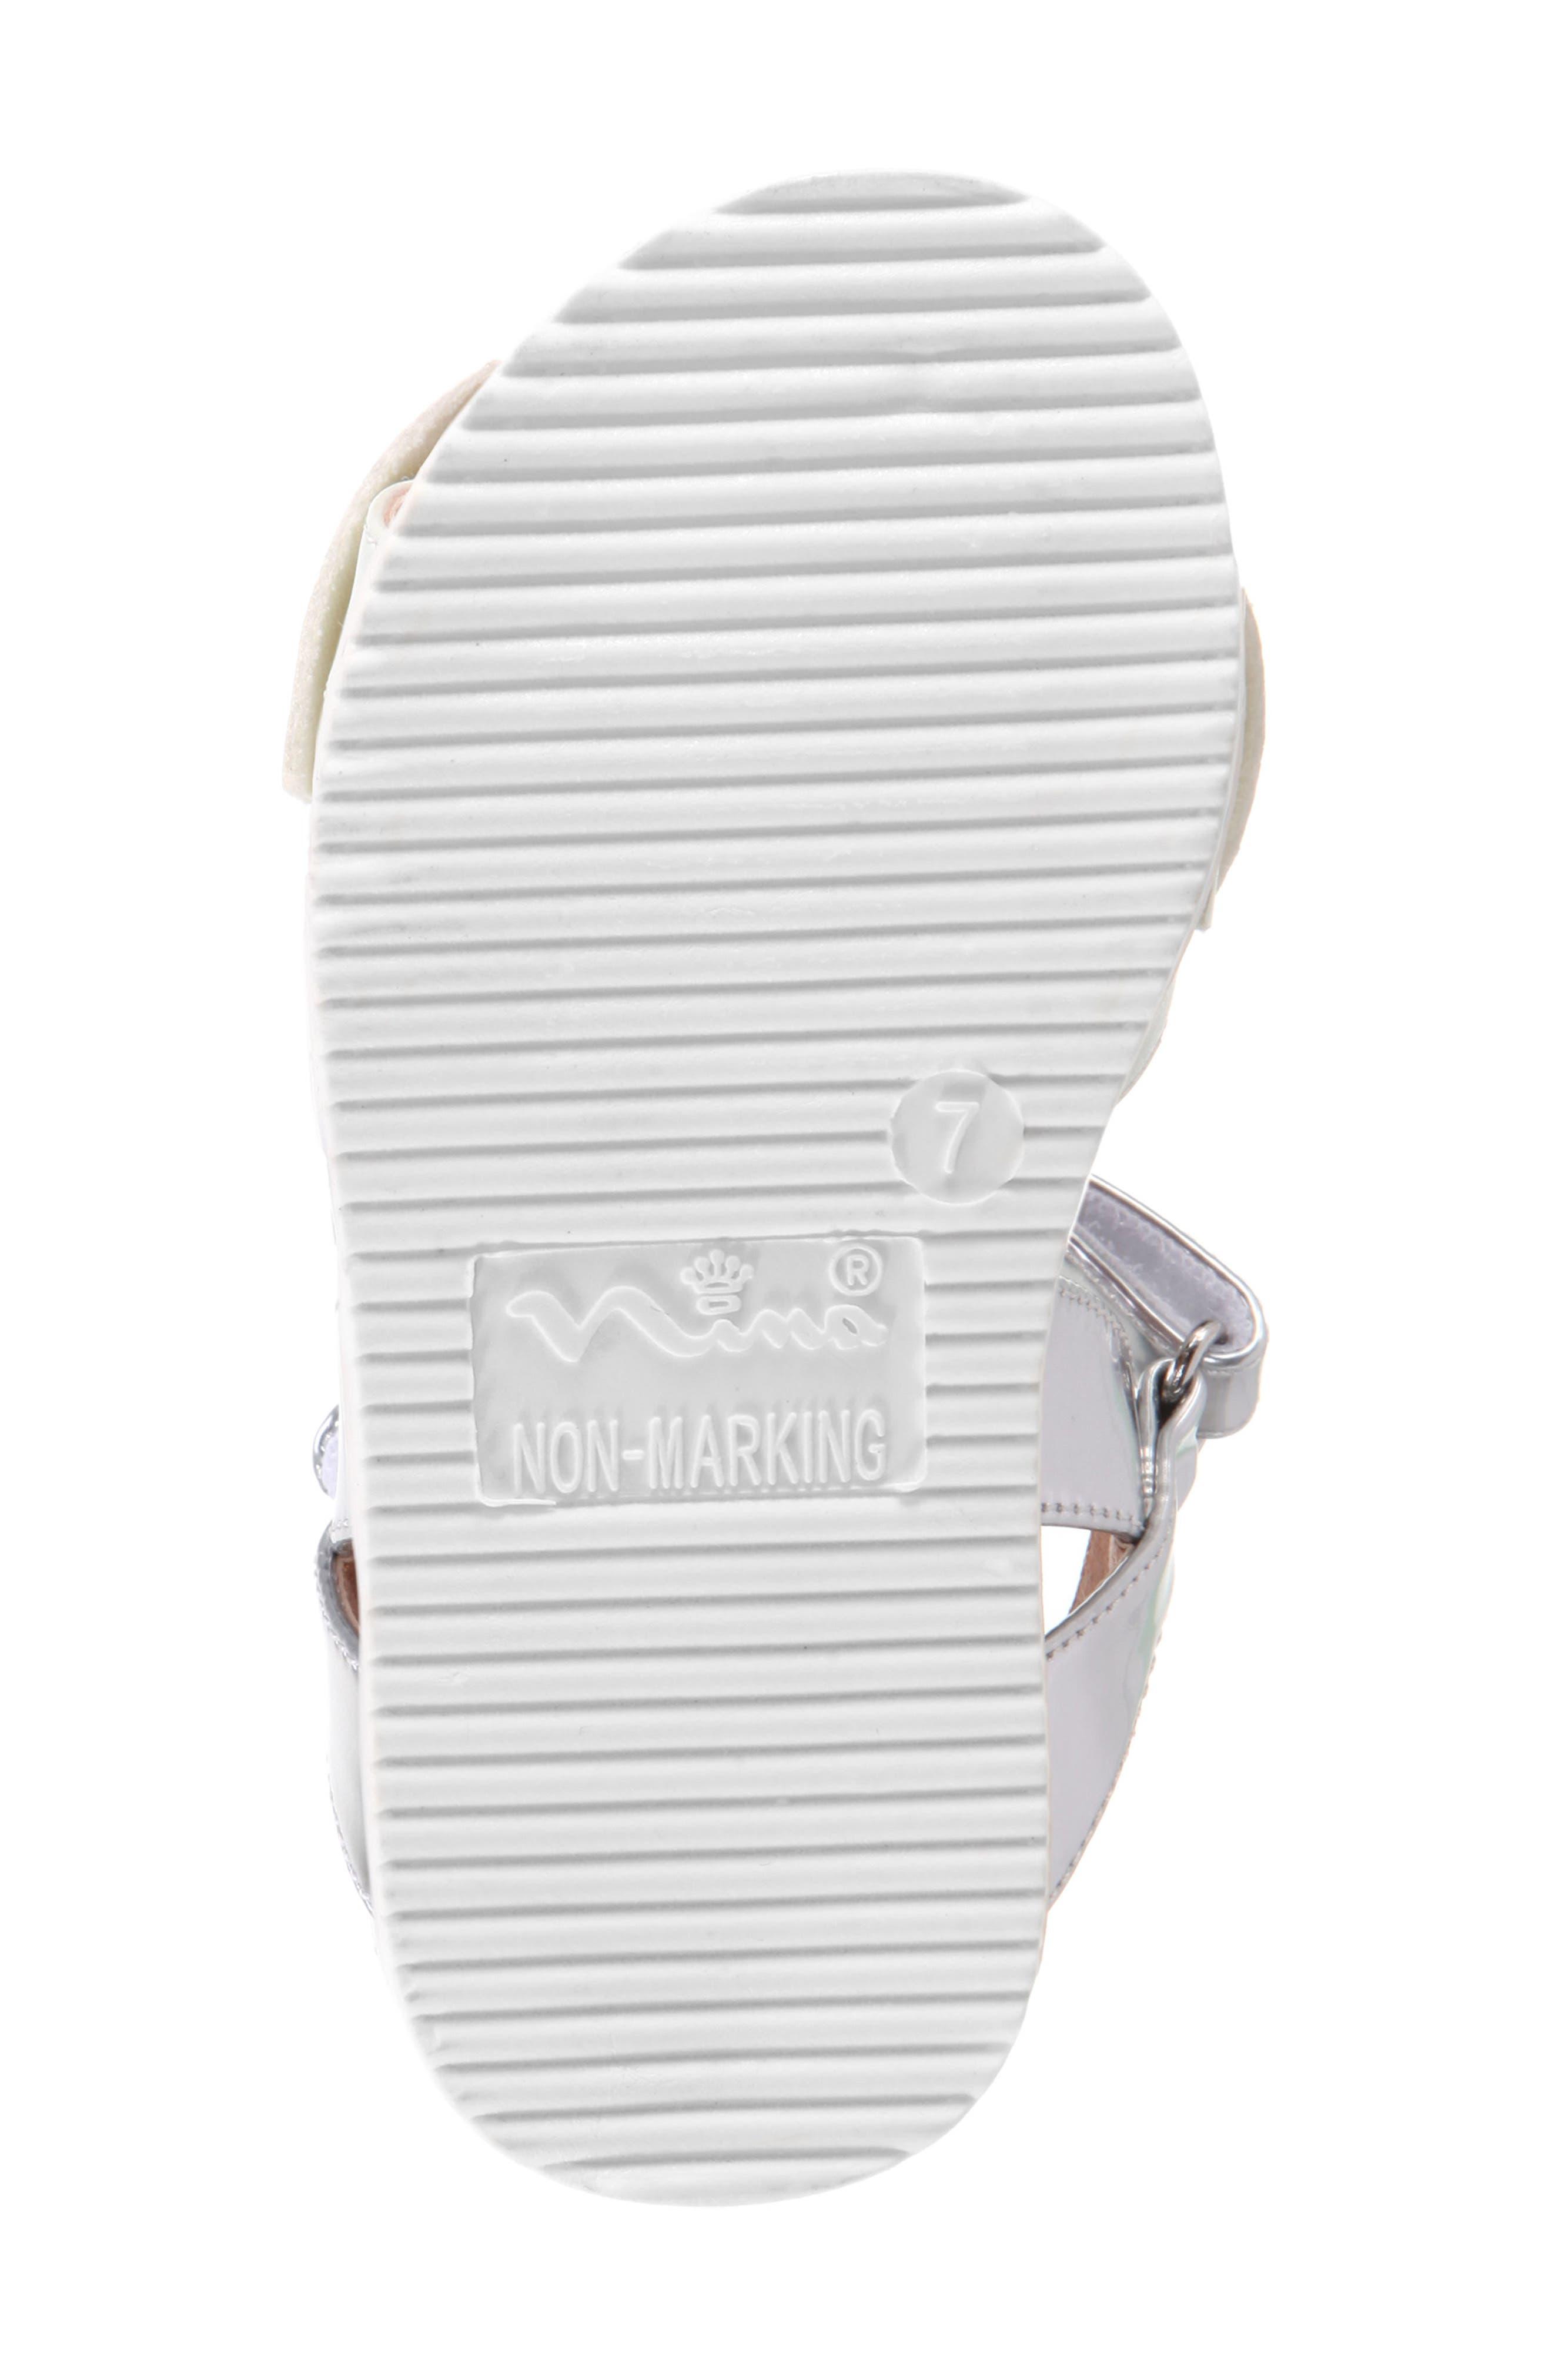 Kaitylyn Bow Sandal,                             Alternate thumbnail 6, color,                             White Metallic/ Silver